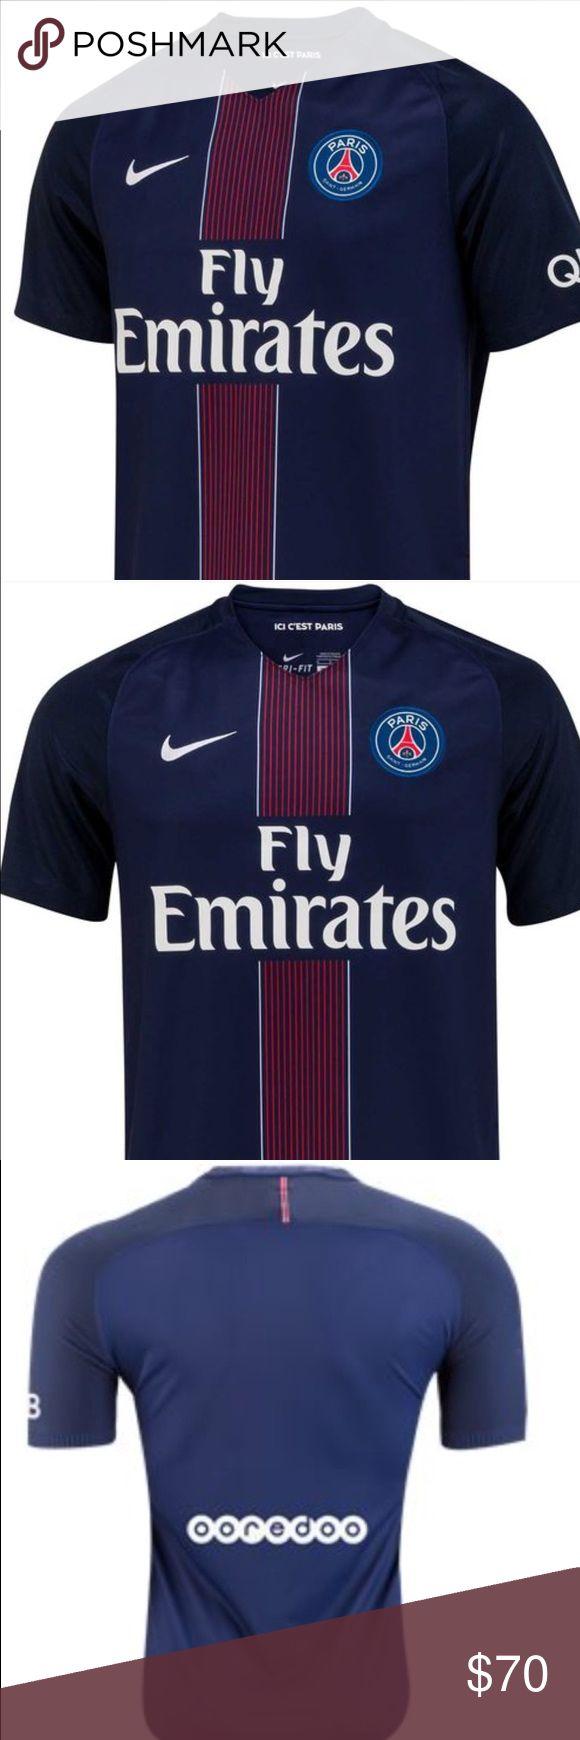 paris saint germain 1617 replica home jersey nwt england euro 2016 home men soccer